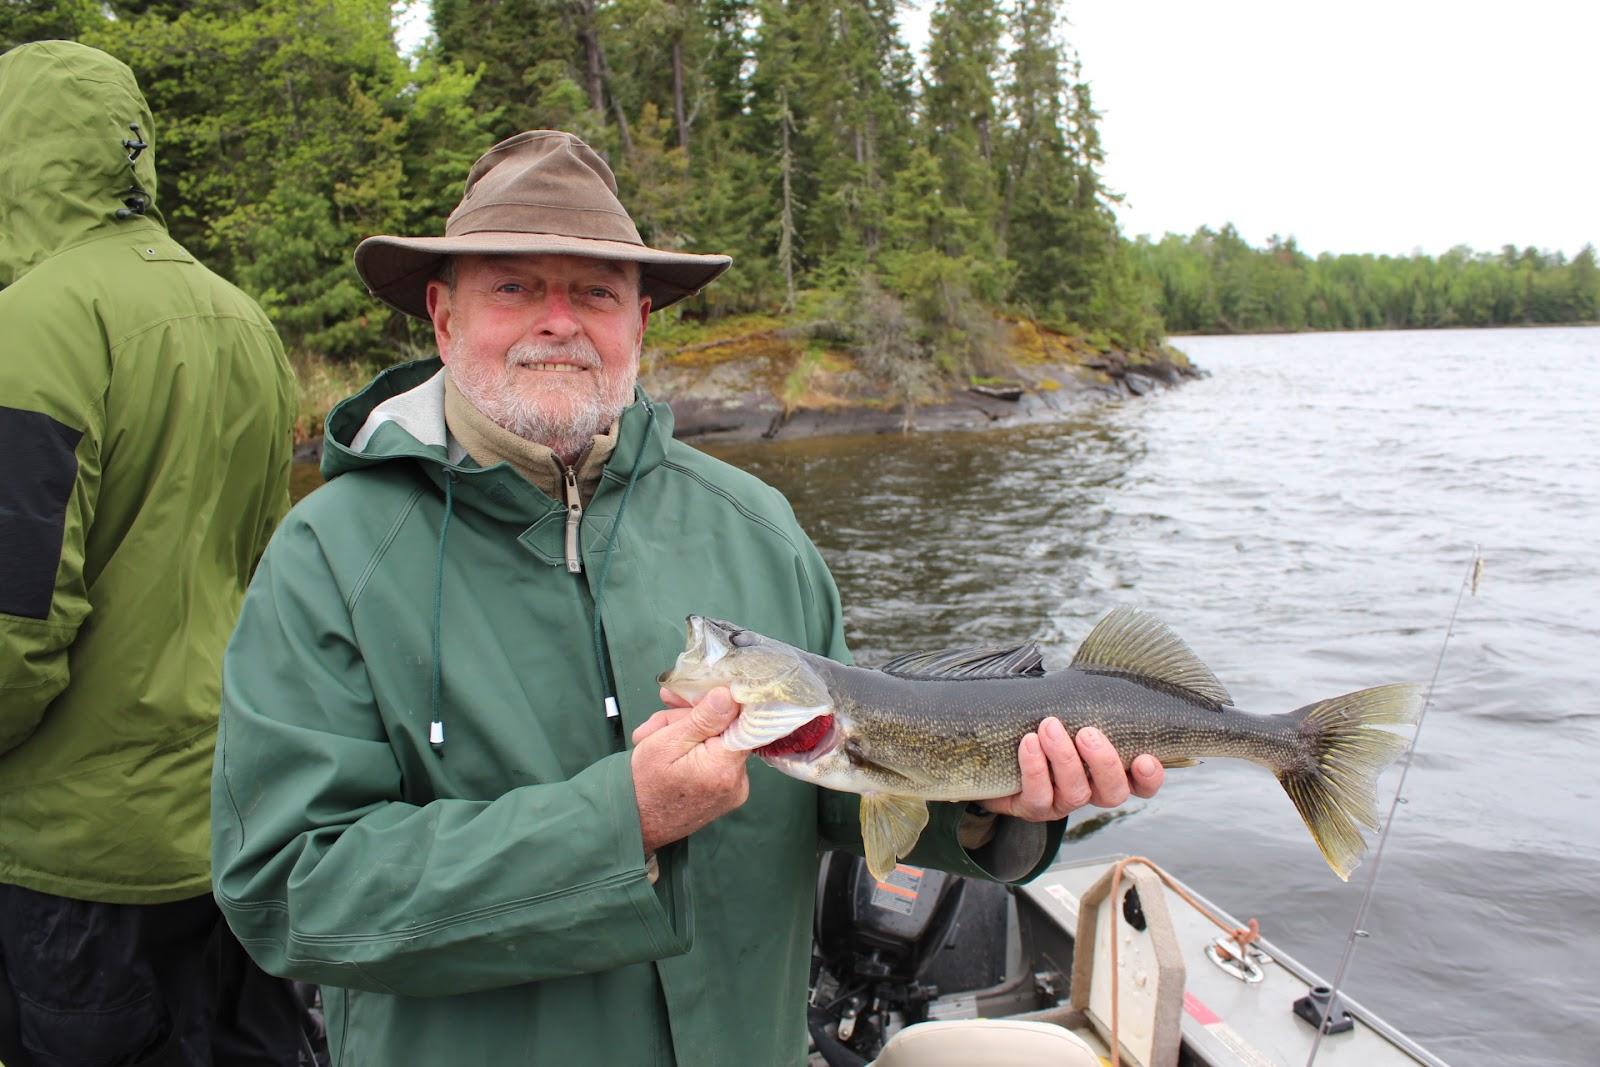 Rainy lake houseboats fishing report great fishing on for Rainy lake fishing report